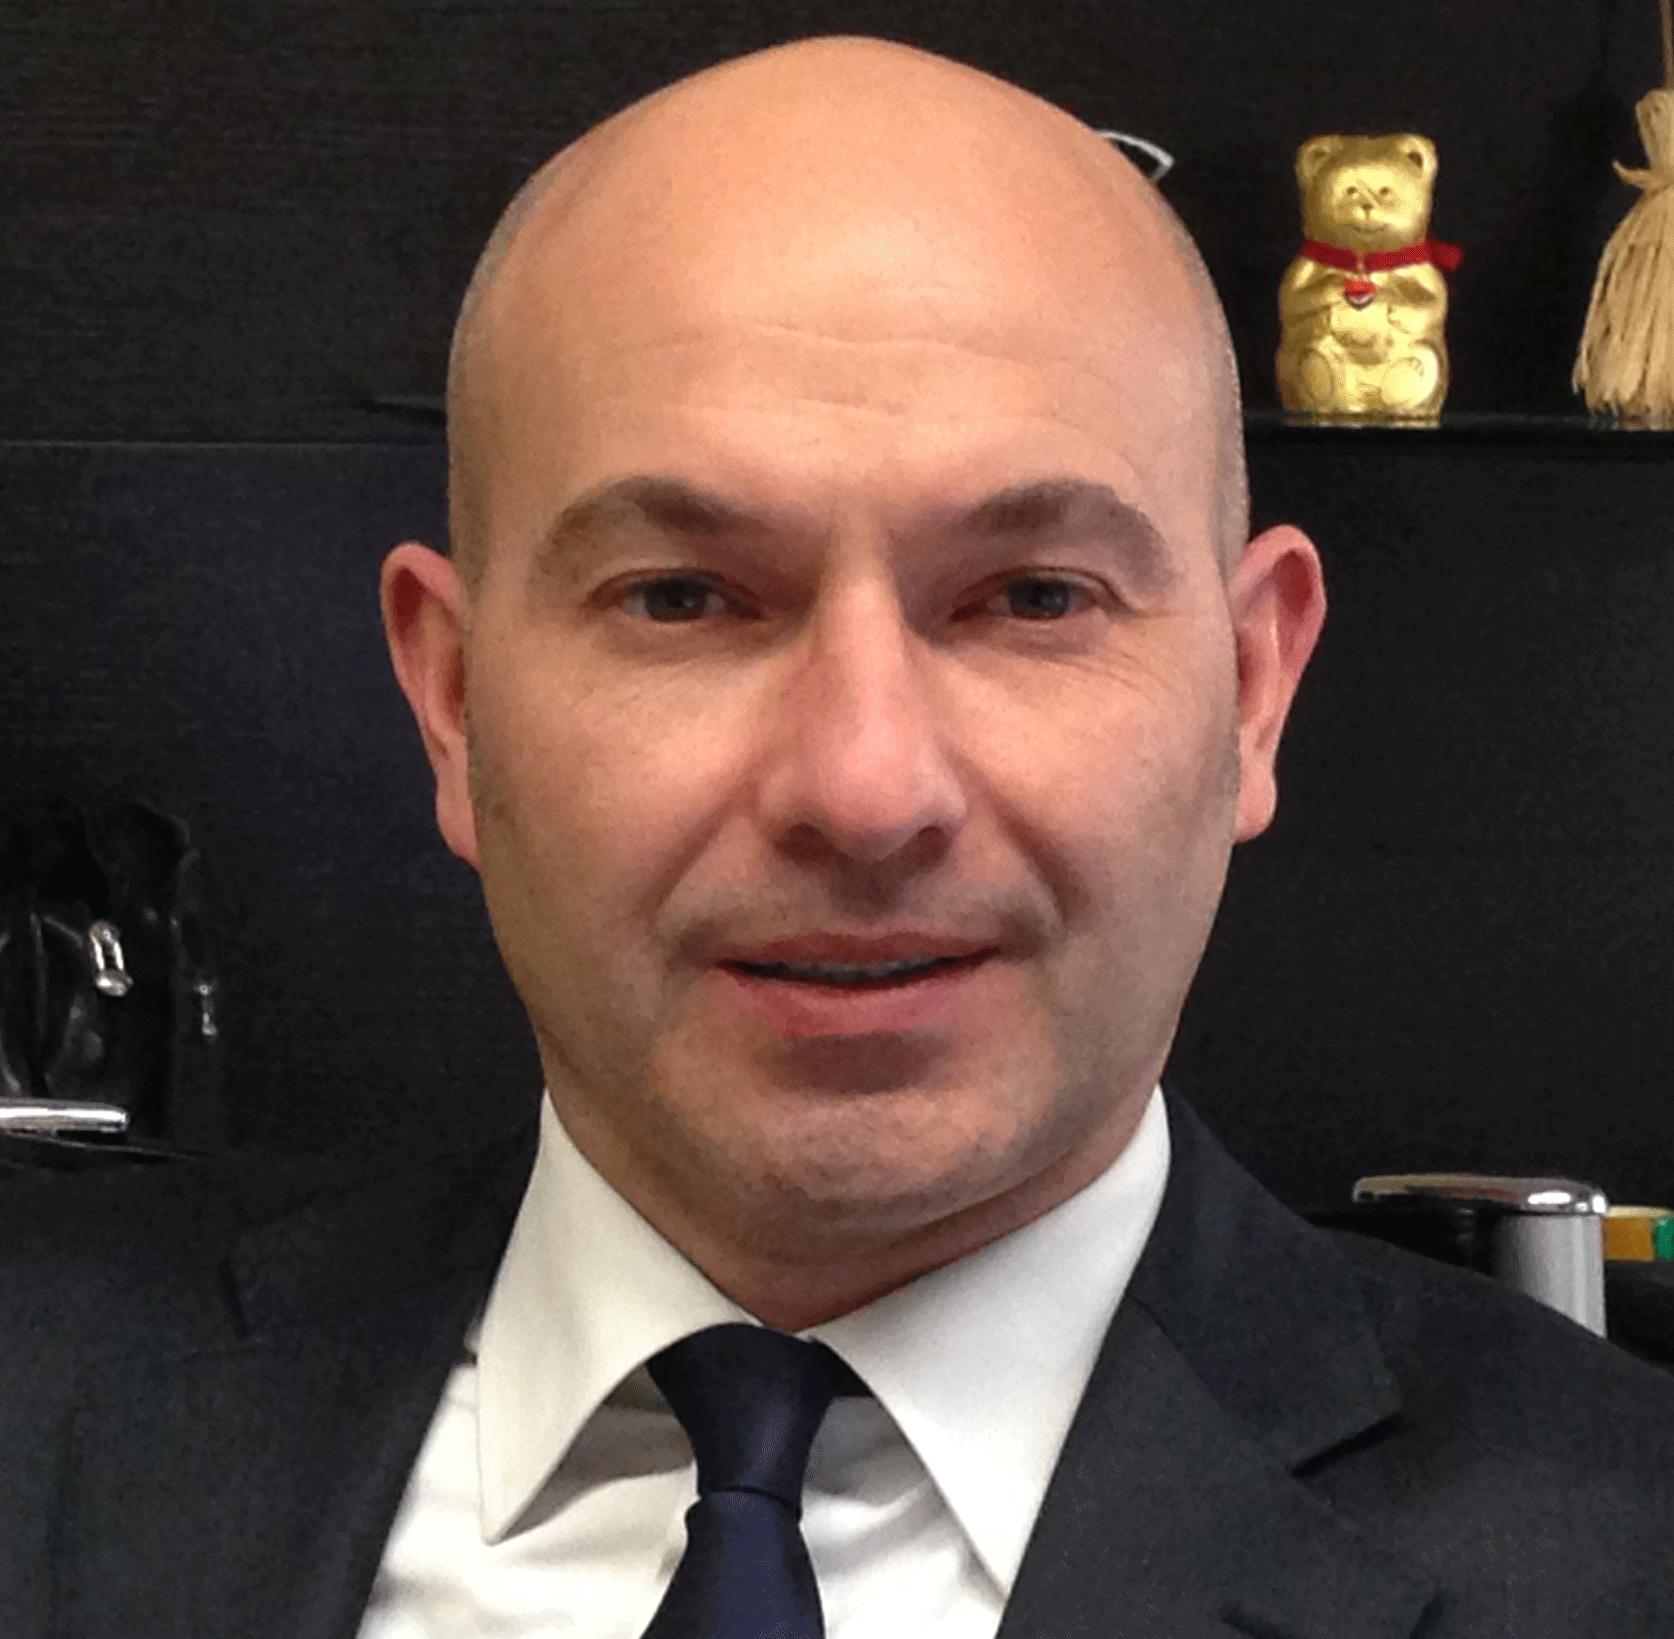 Roberto Brioschi, Vice President Italy, France and Spain di COMPAREX